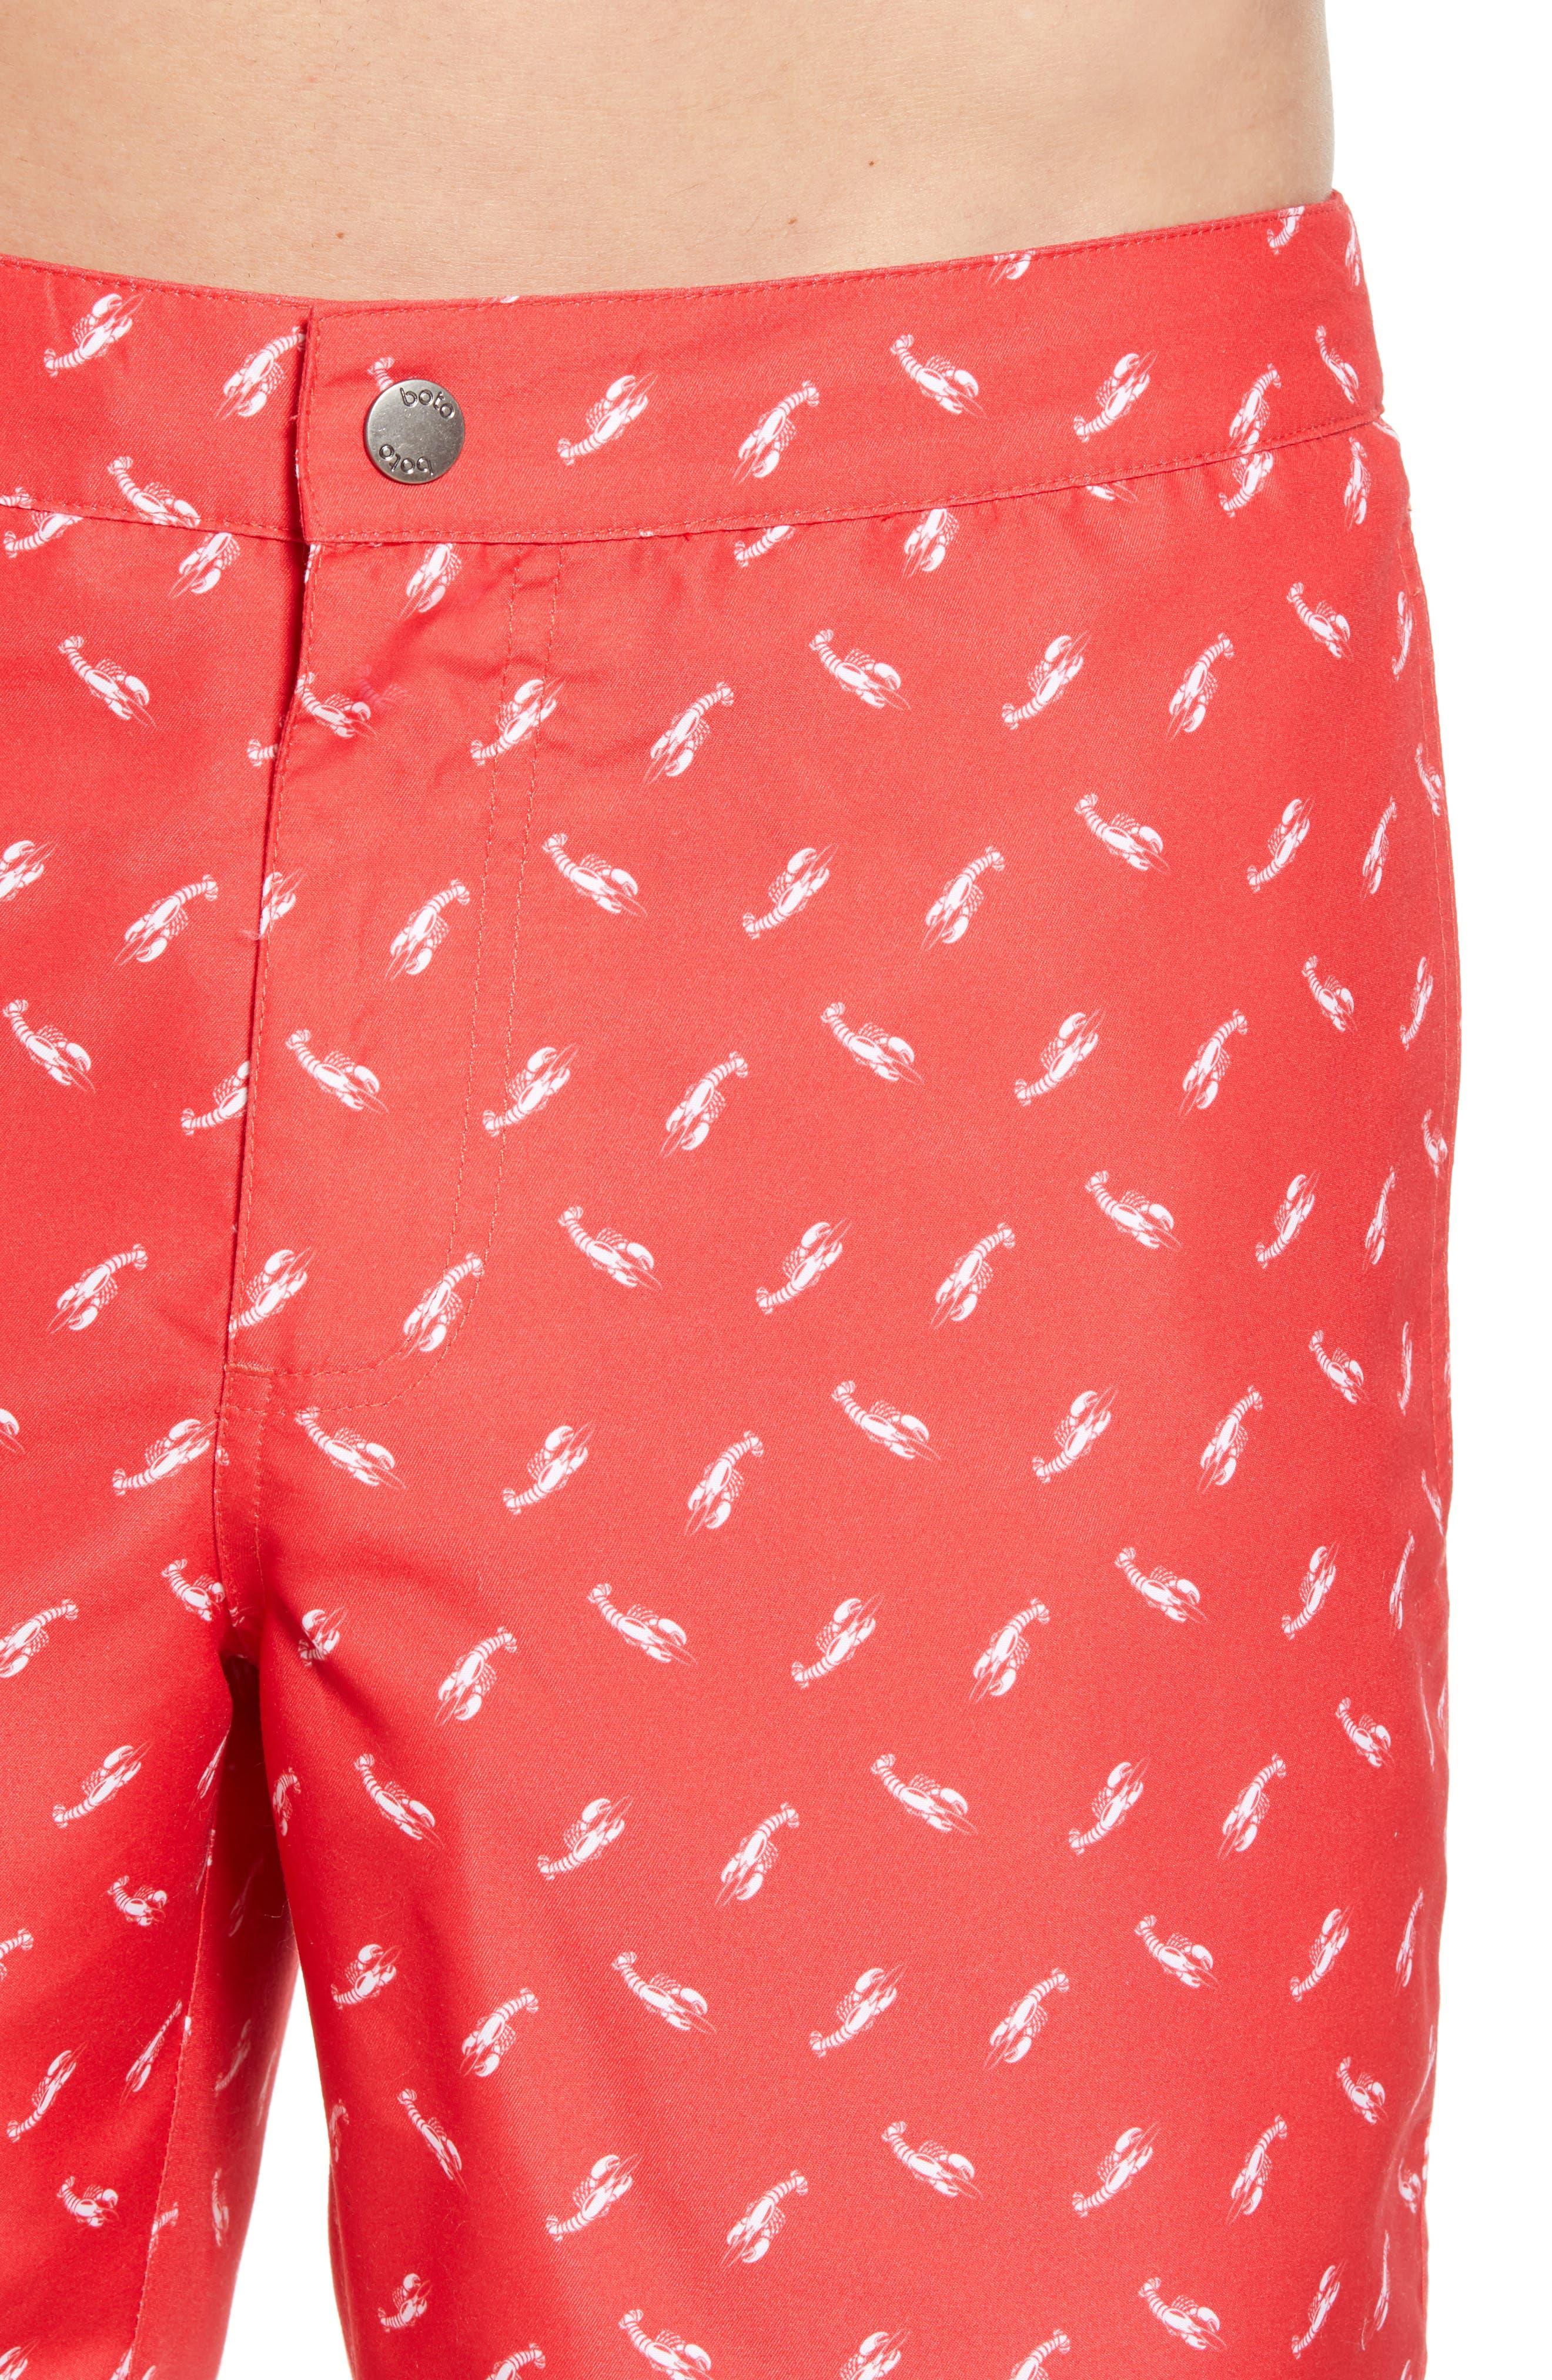 Aruba Slim Fit Swim Trunks,                             Alternate thumbnail 4, color,                             Red Lobsters Print